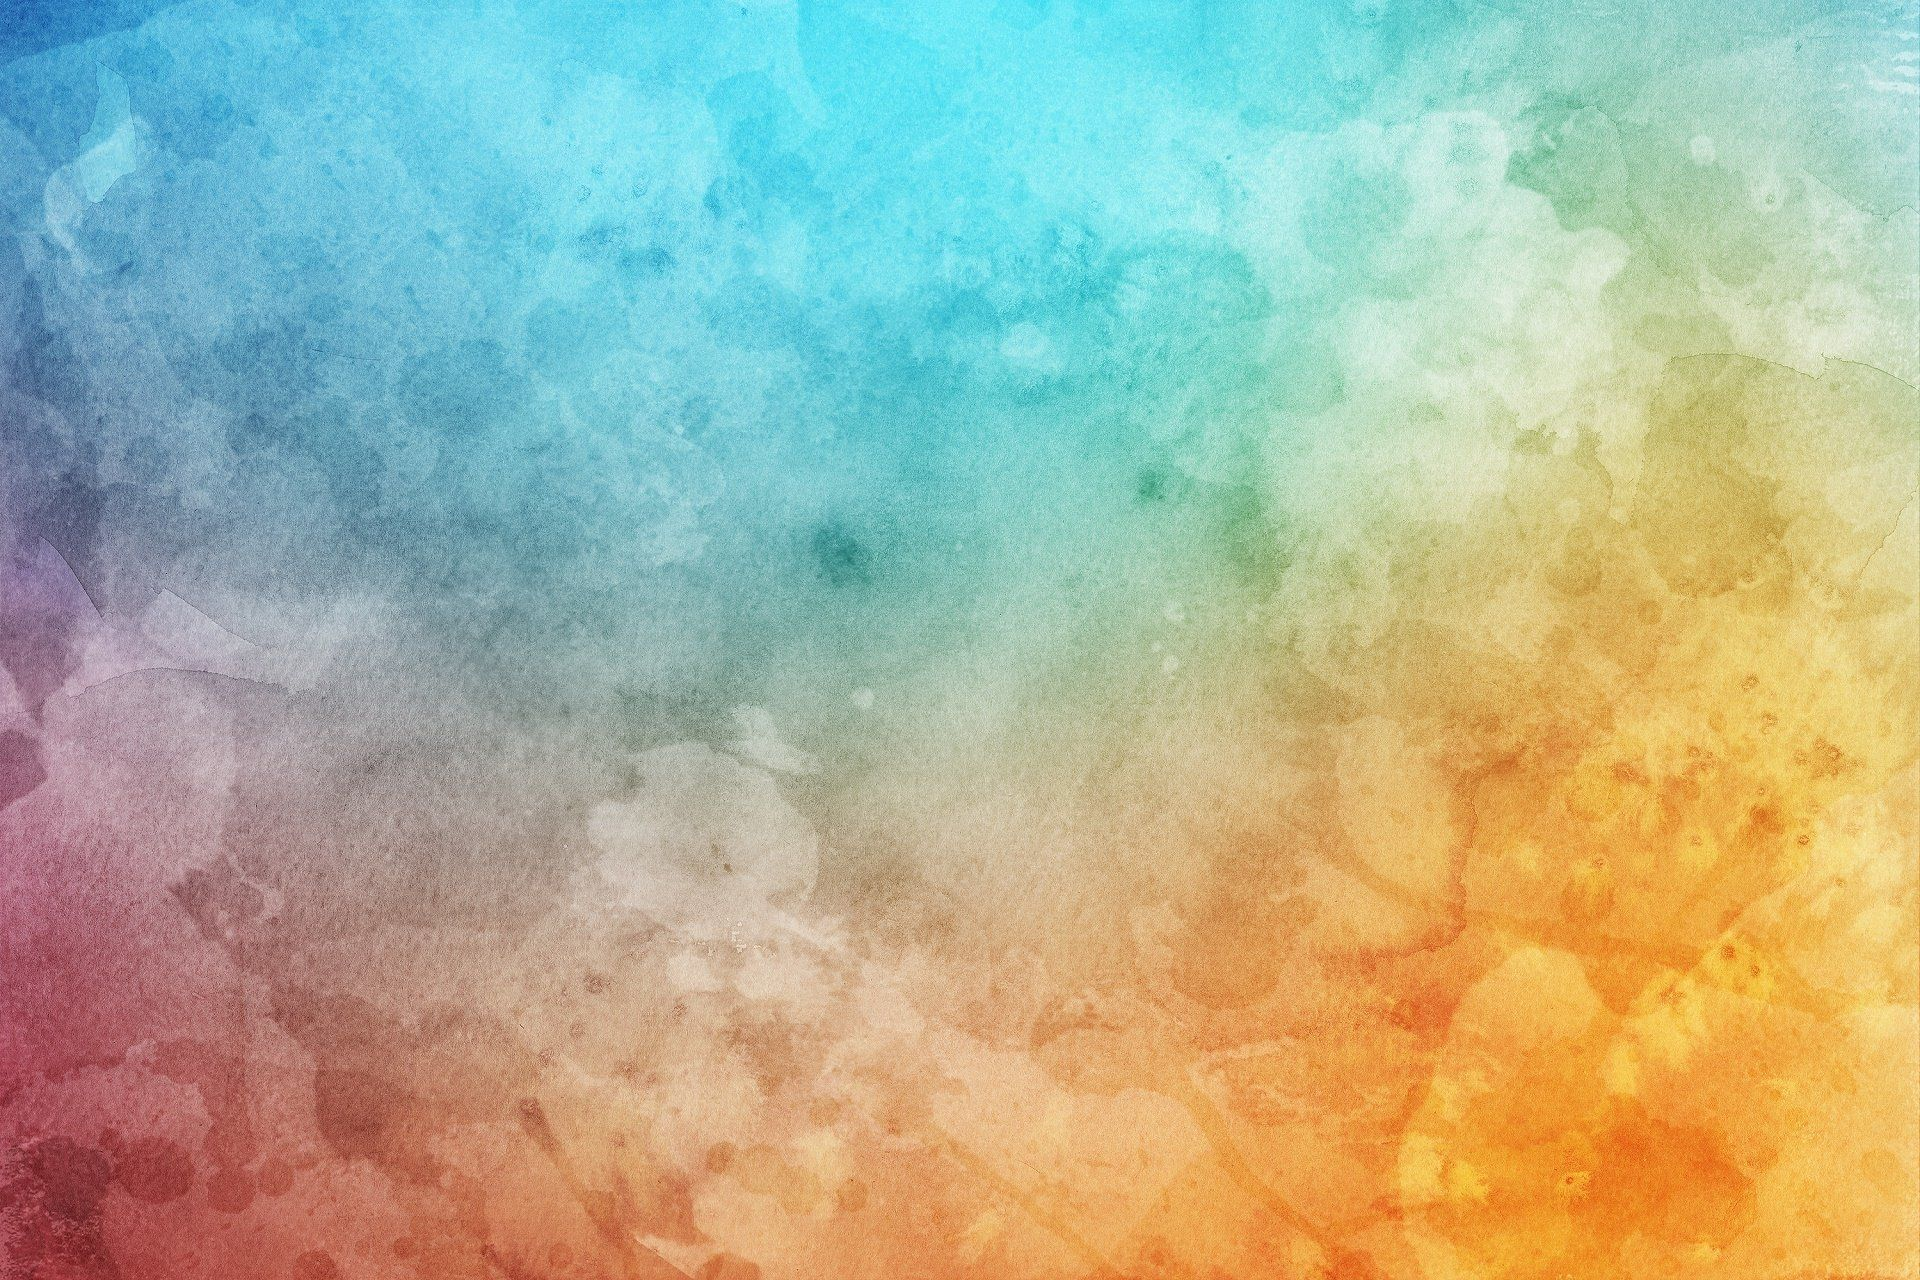 Watercolor Wallpapers   Top Watercolor Backgrounds 1920x1280